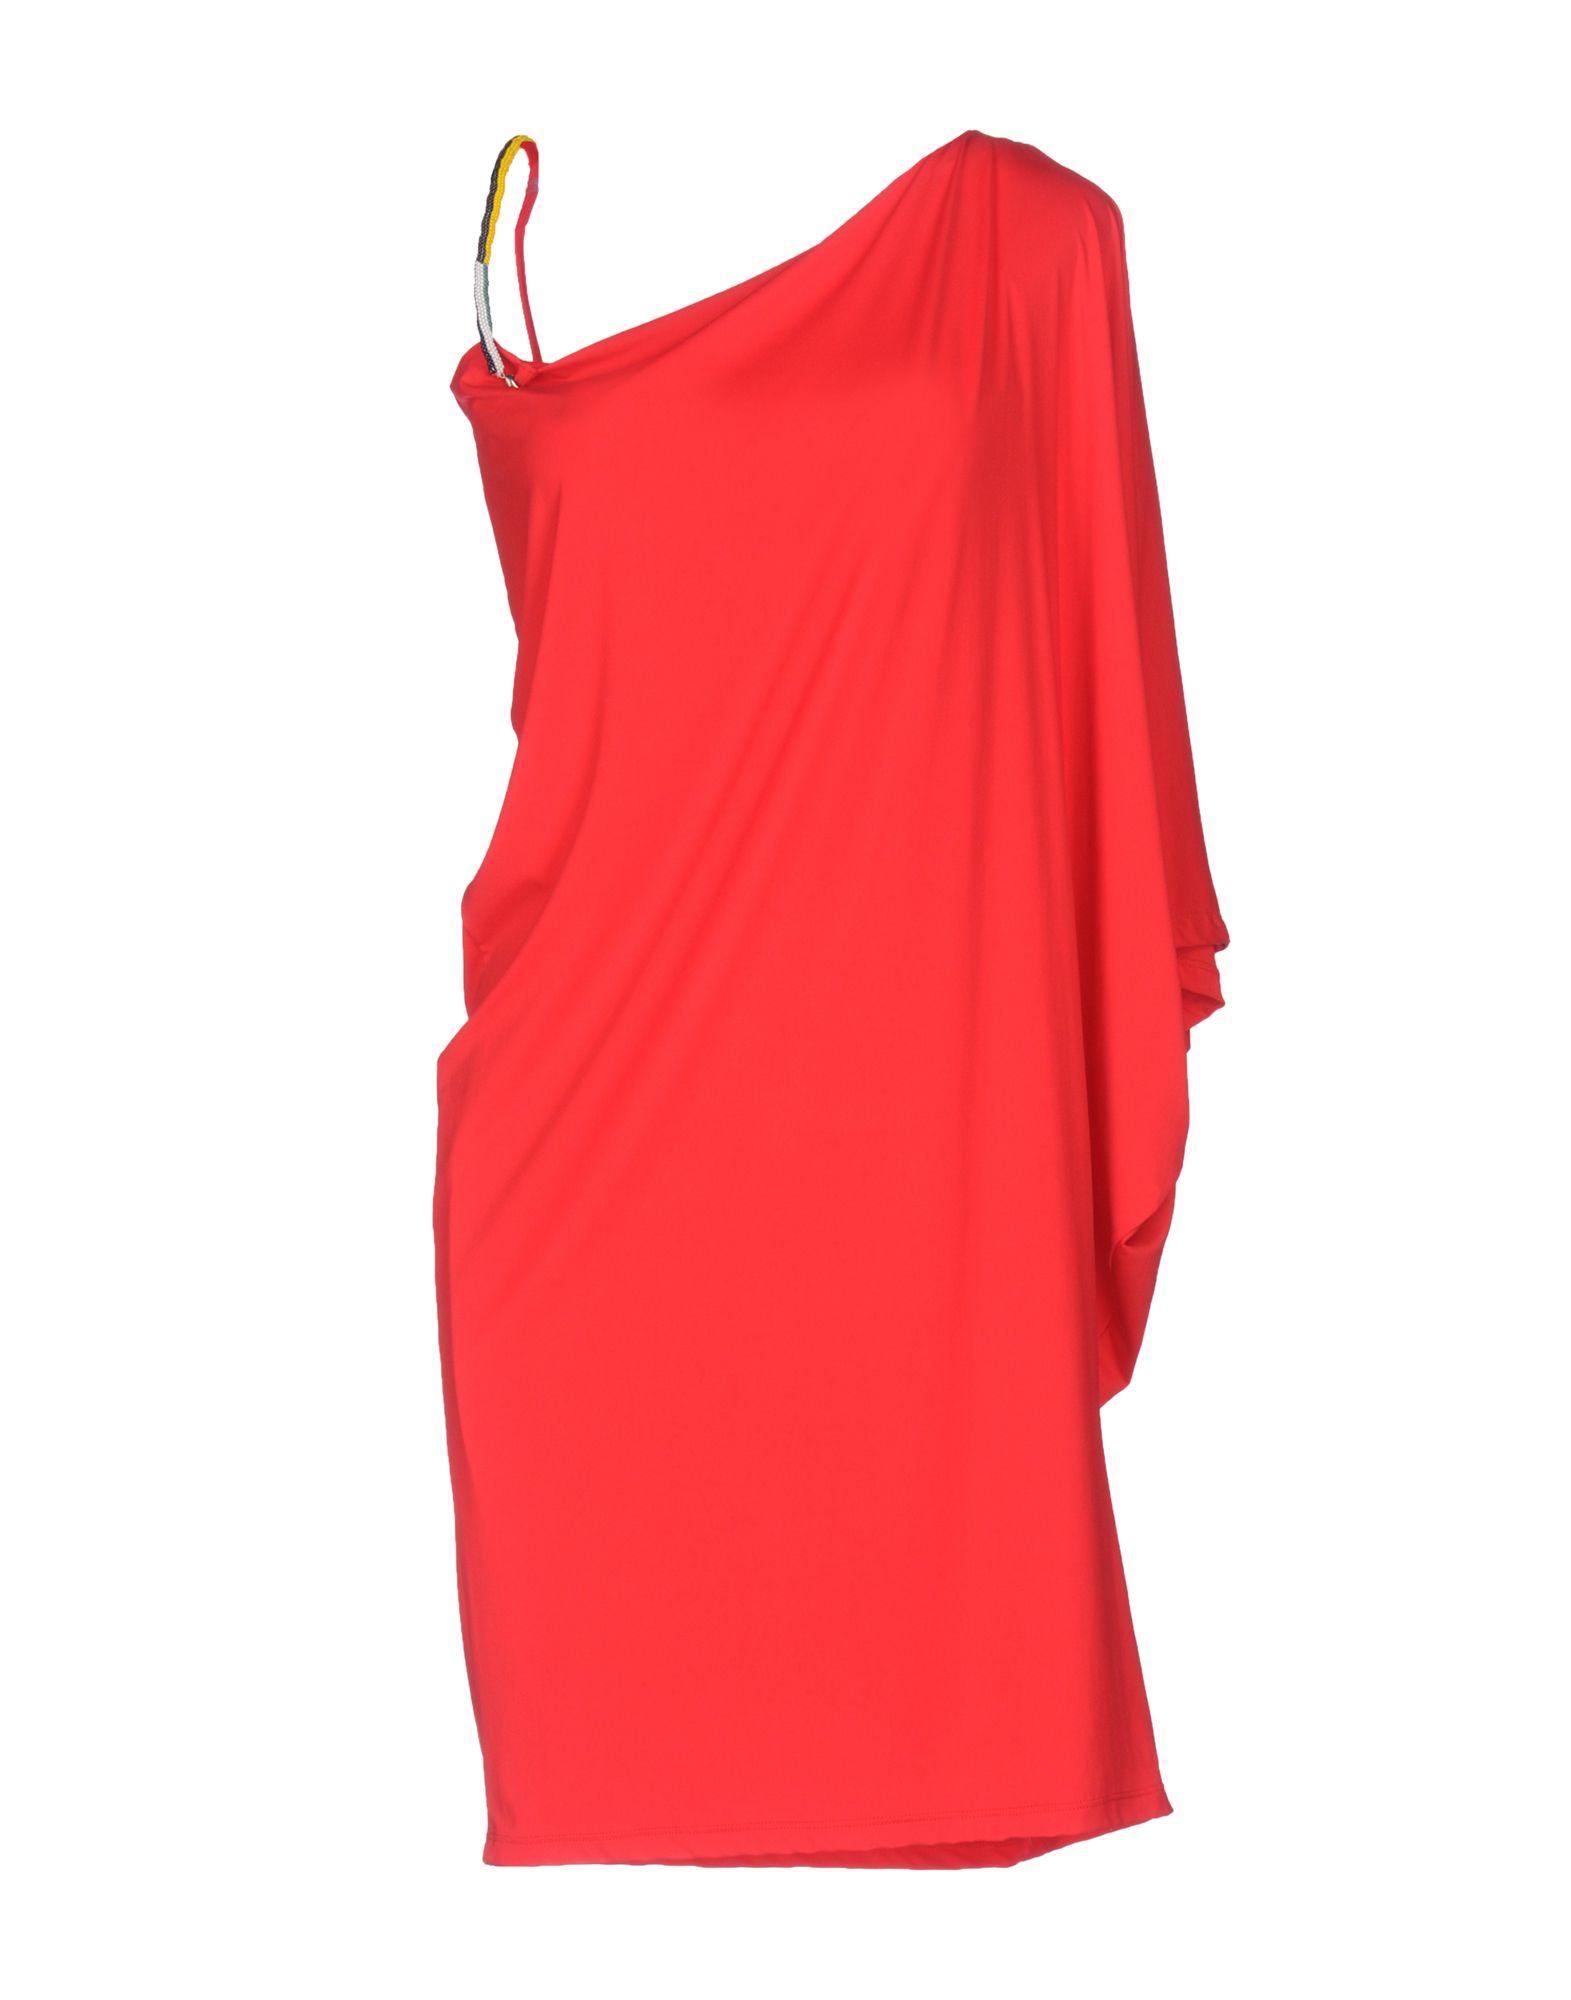 VANDA CATUCCI Knee-Length Dress in Red